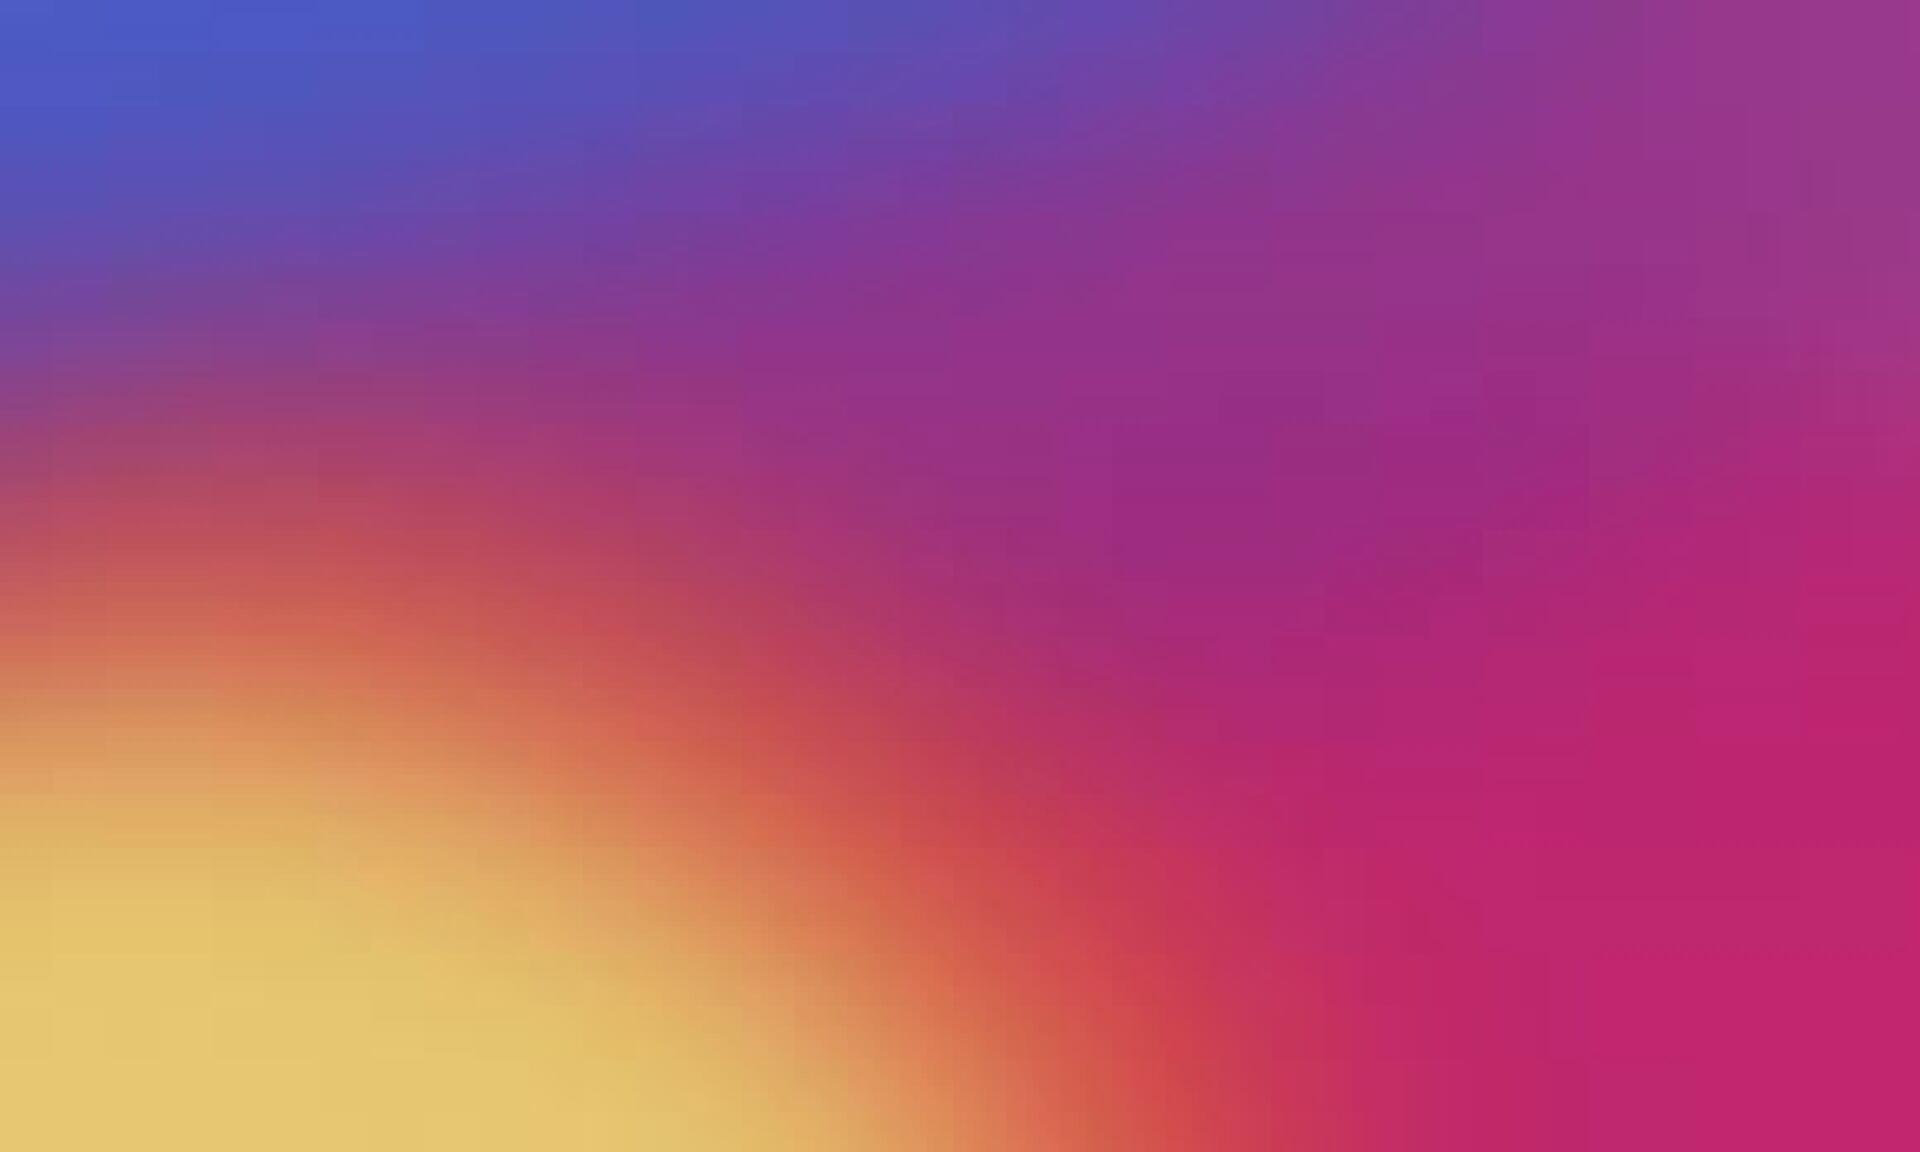 same rainbow pattern that instagram uses in logo